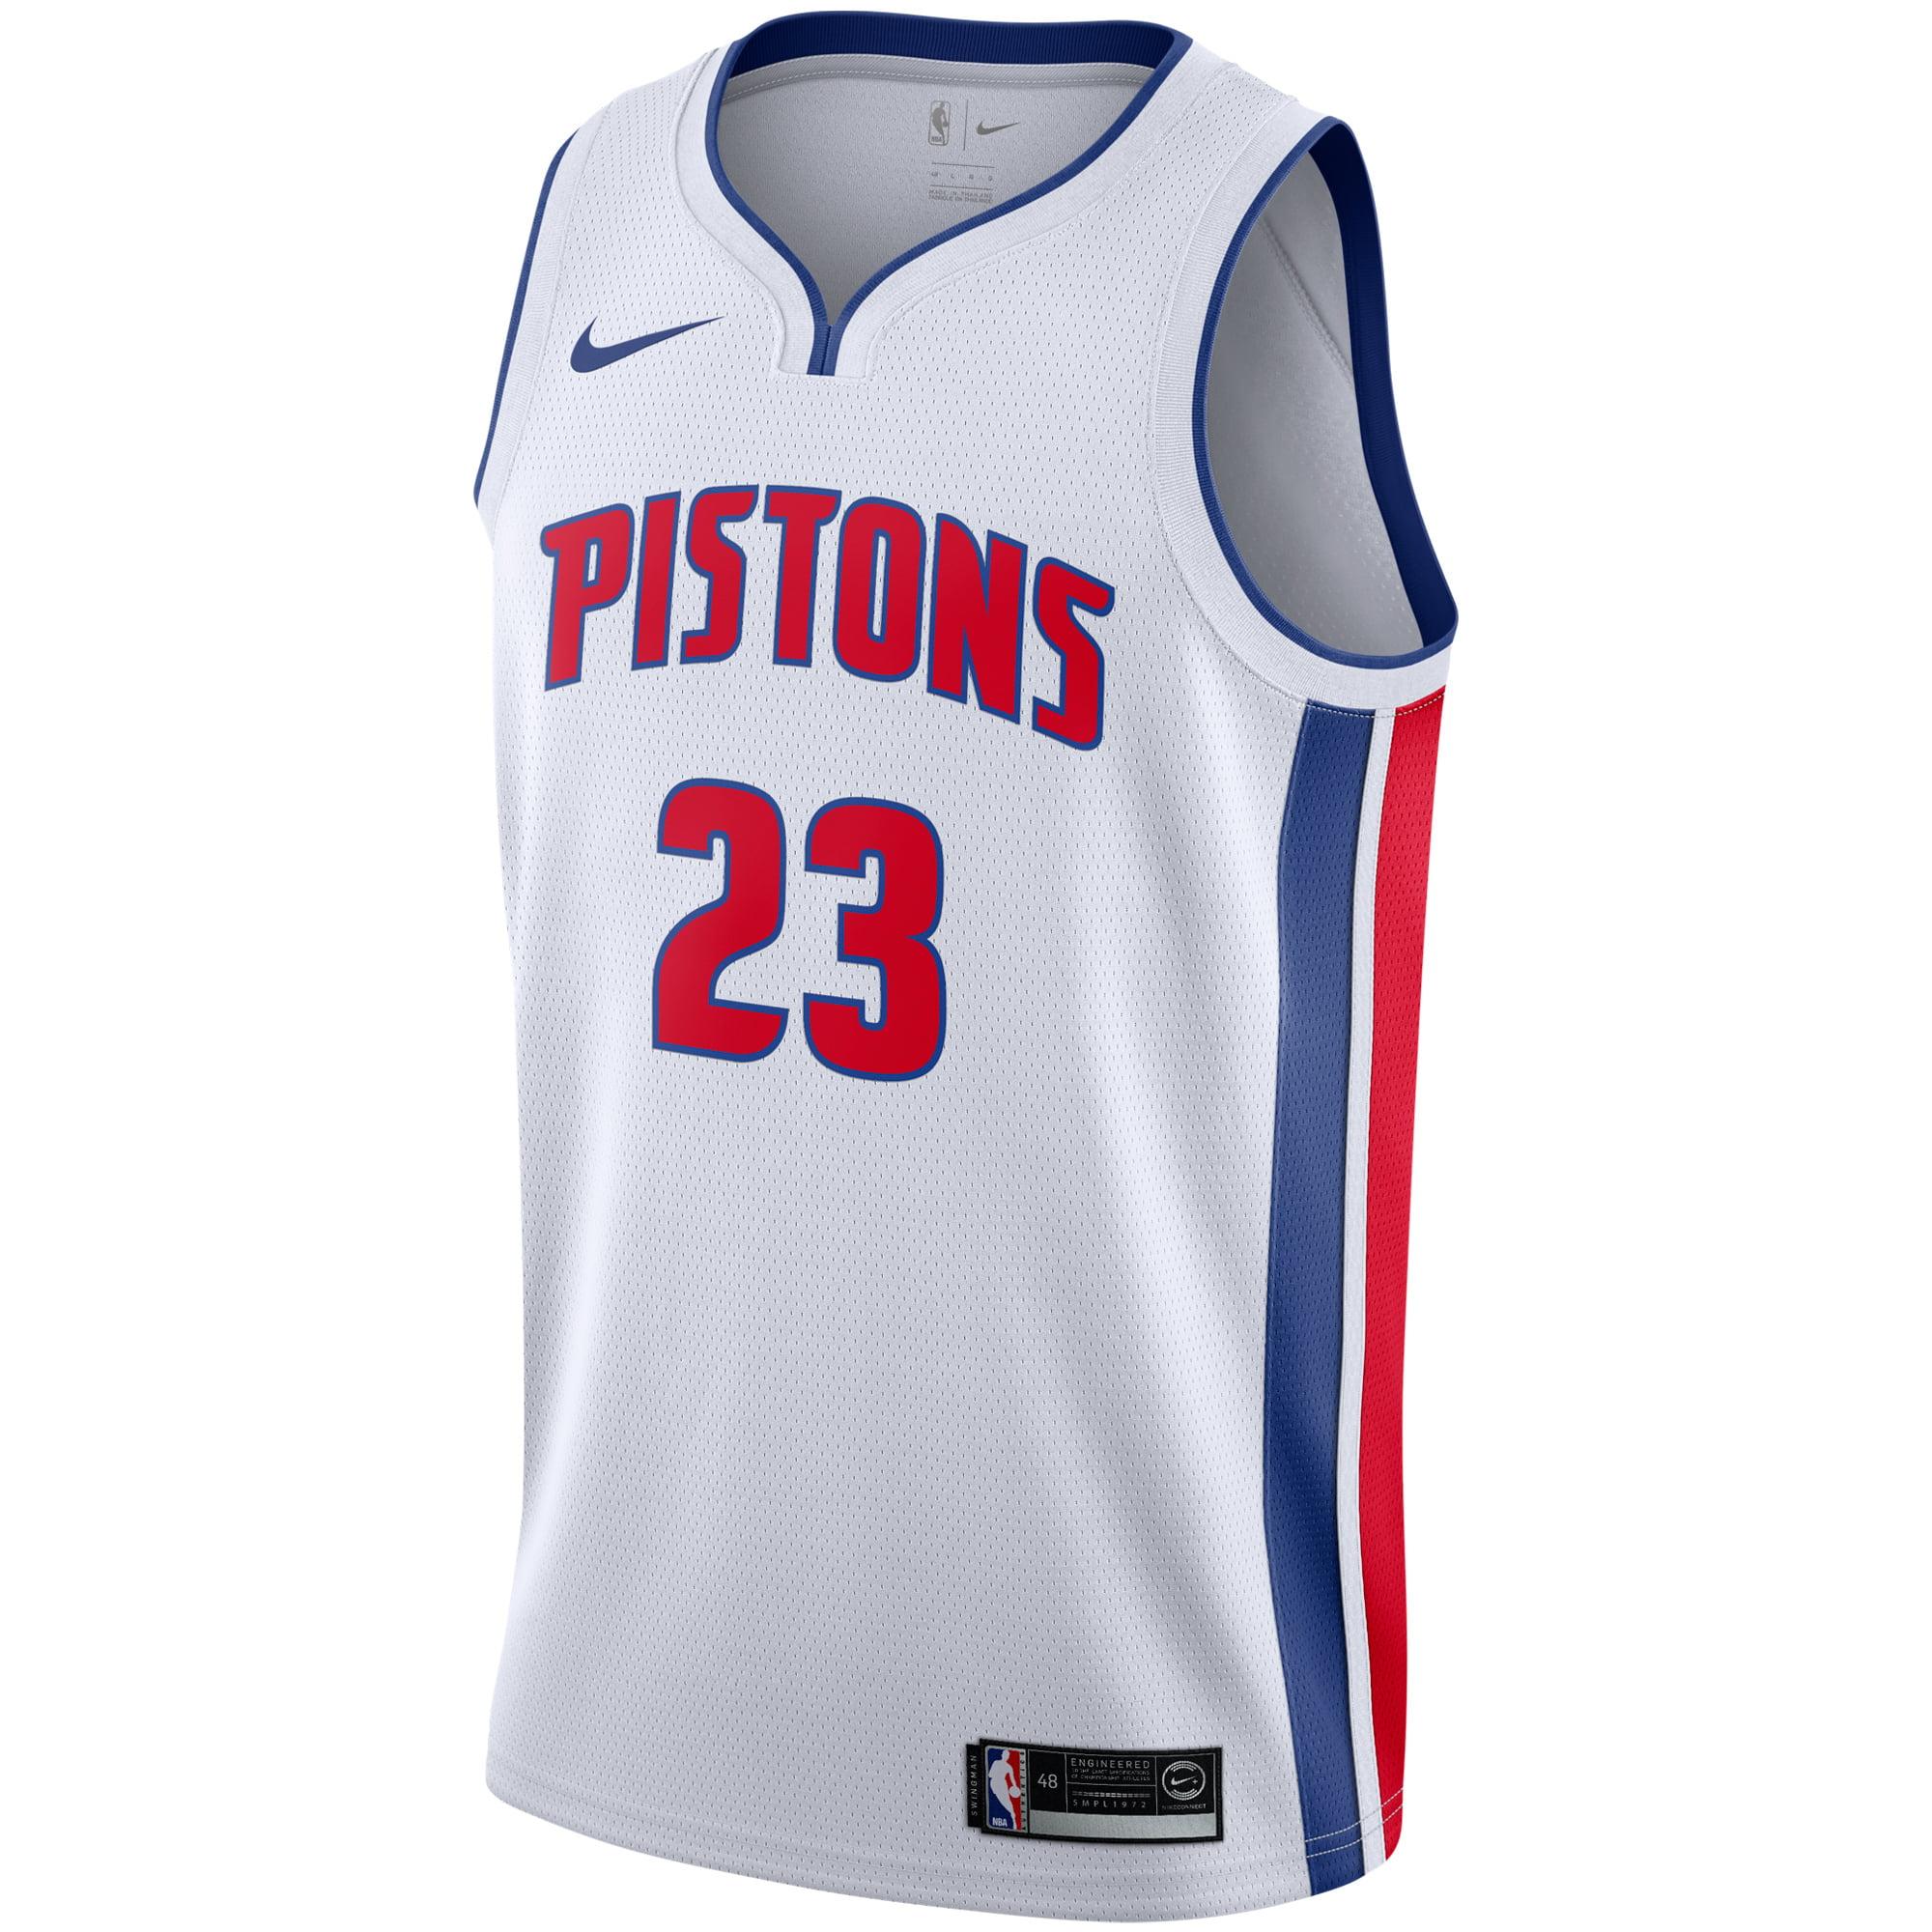 0f816113f Blake Griffin Detroit Pistons Nike Replica Swingman Jersey - Association  Edition - White - Walmart.com